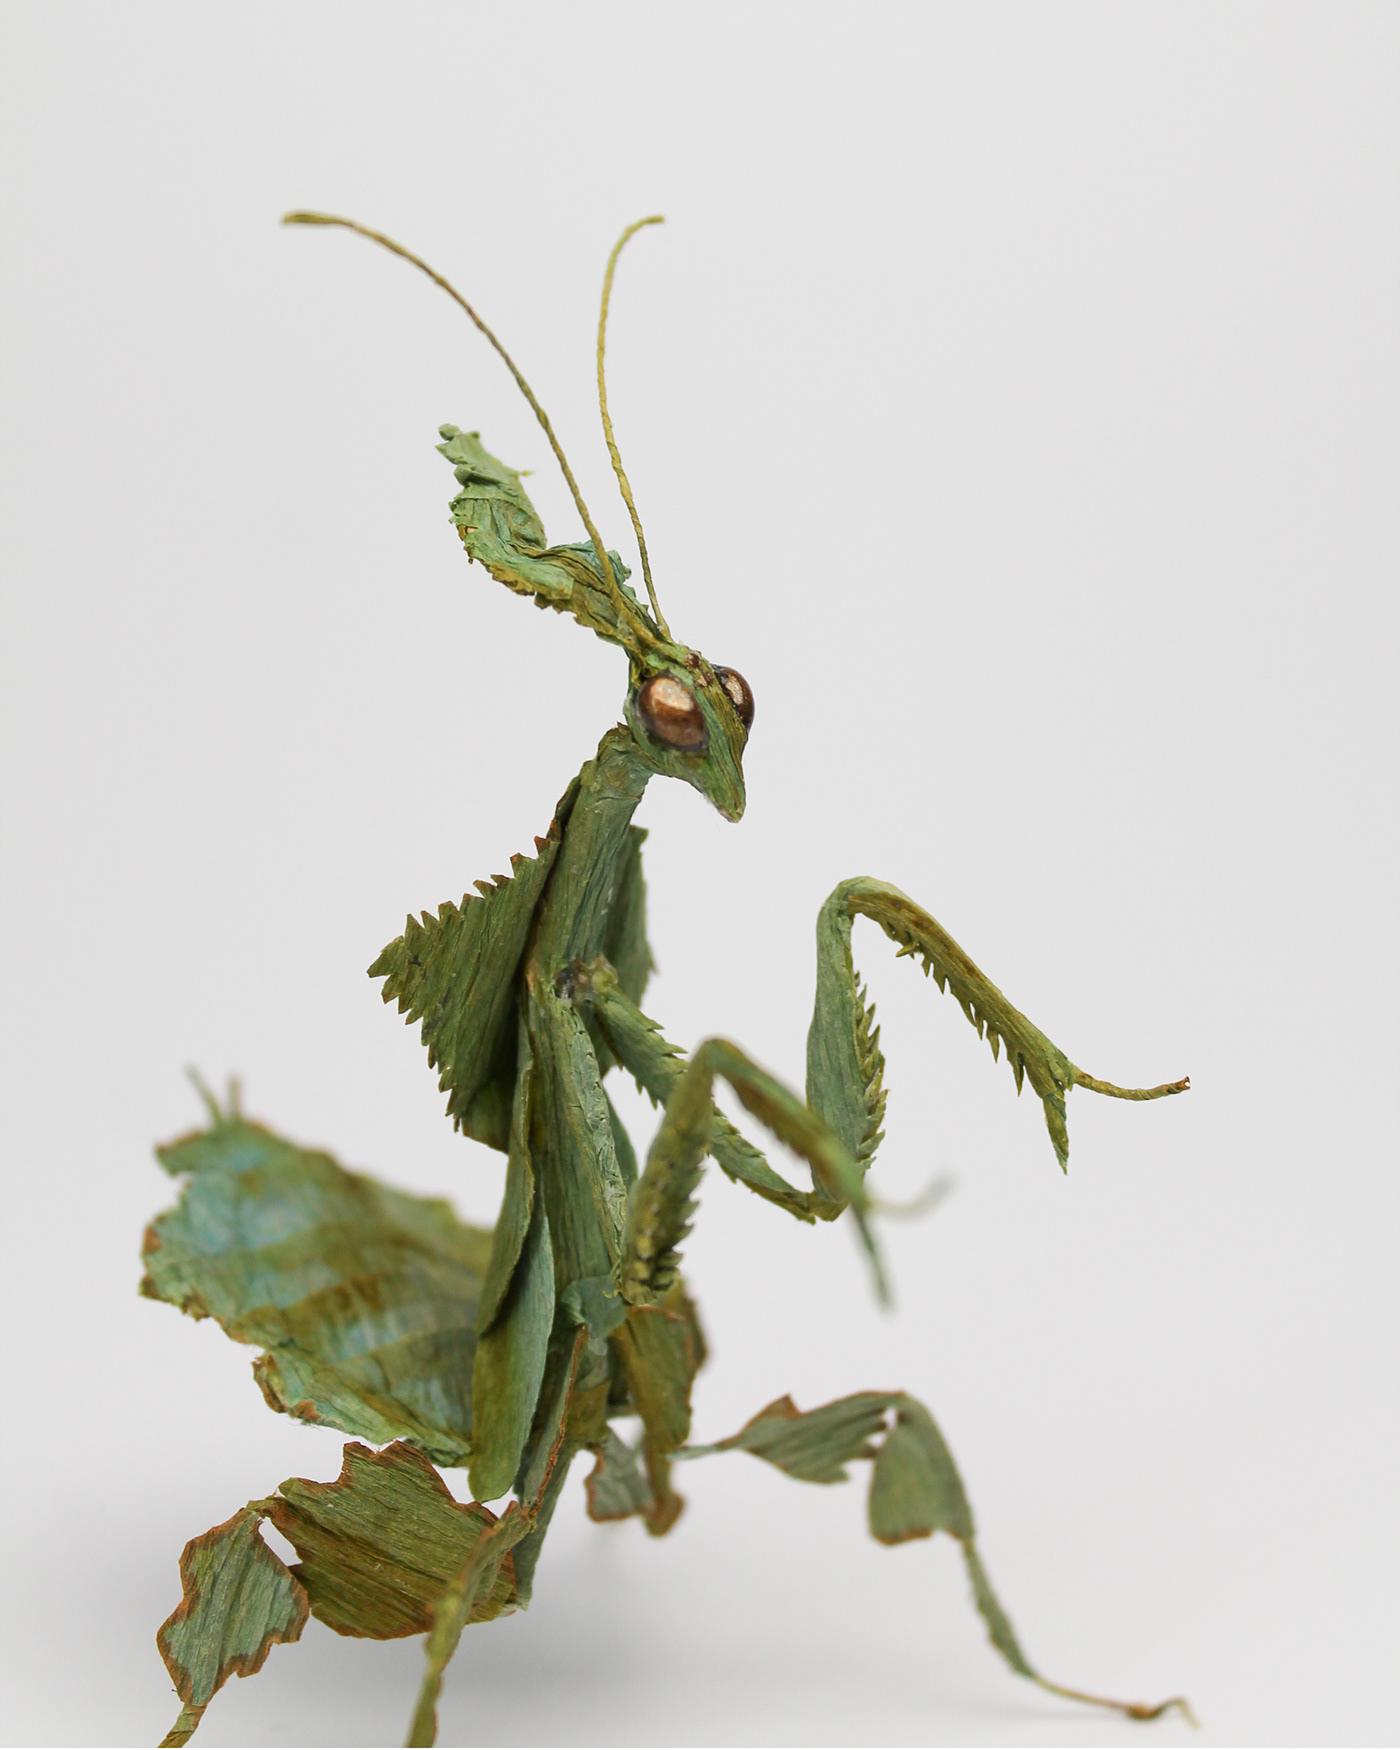 craft ghost mantis handcrafted mantis paper art paper artwork paper insect paper sculpture sculpture